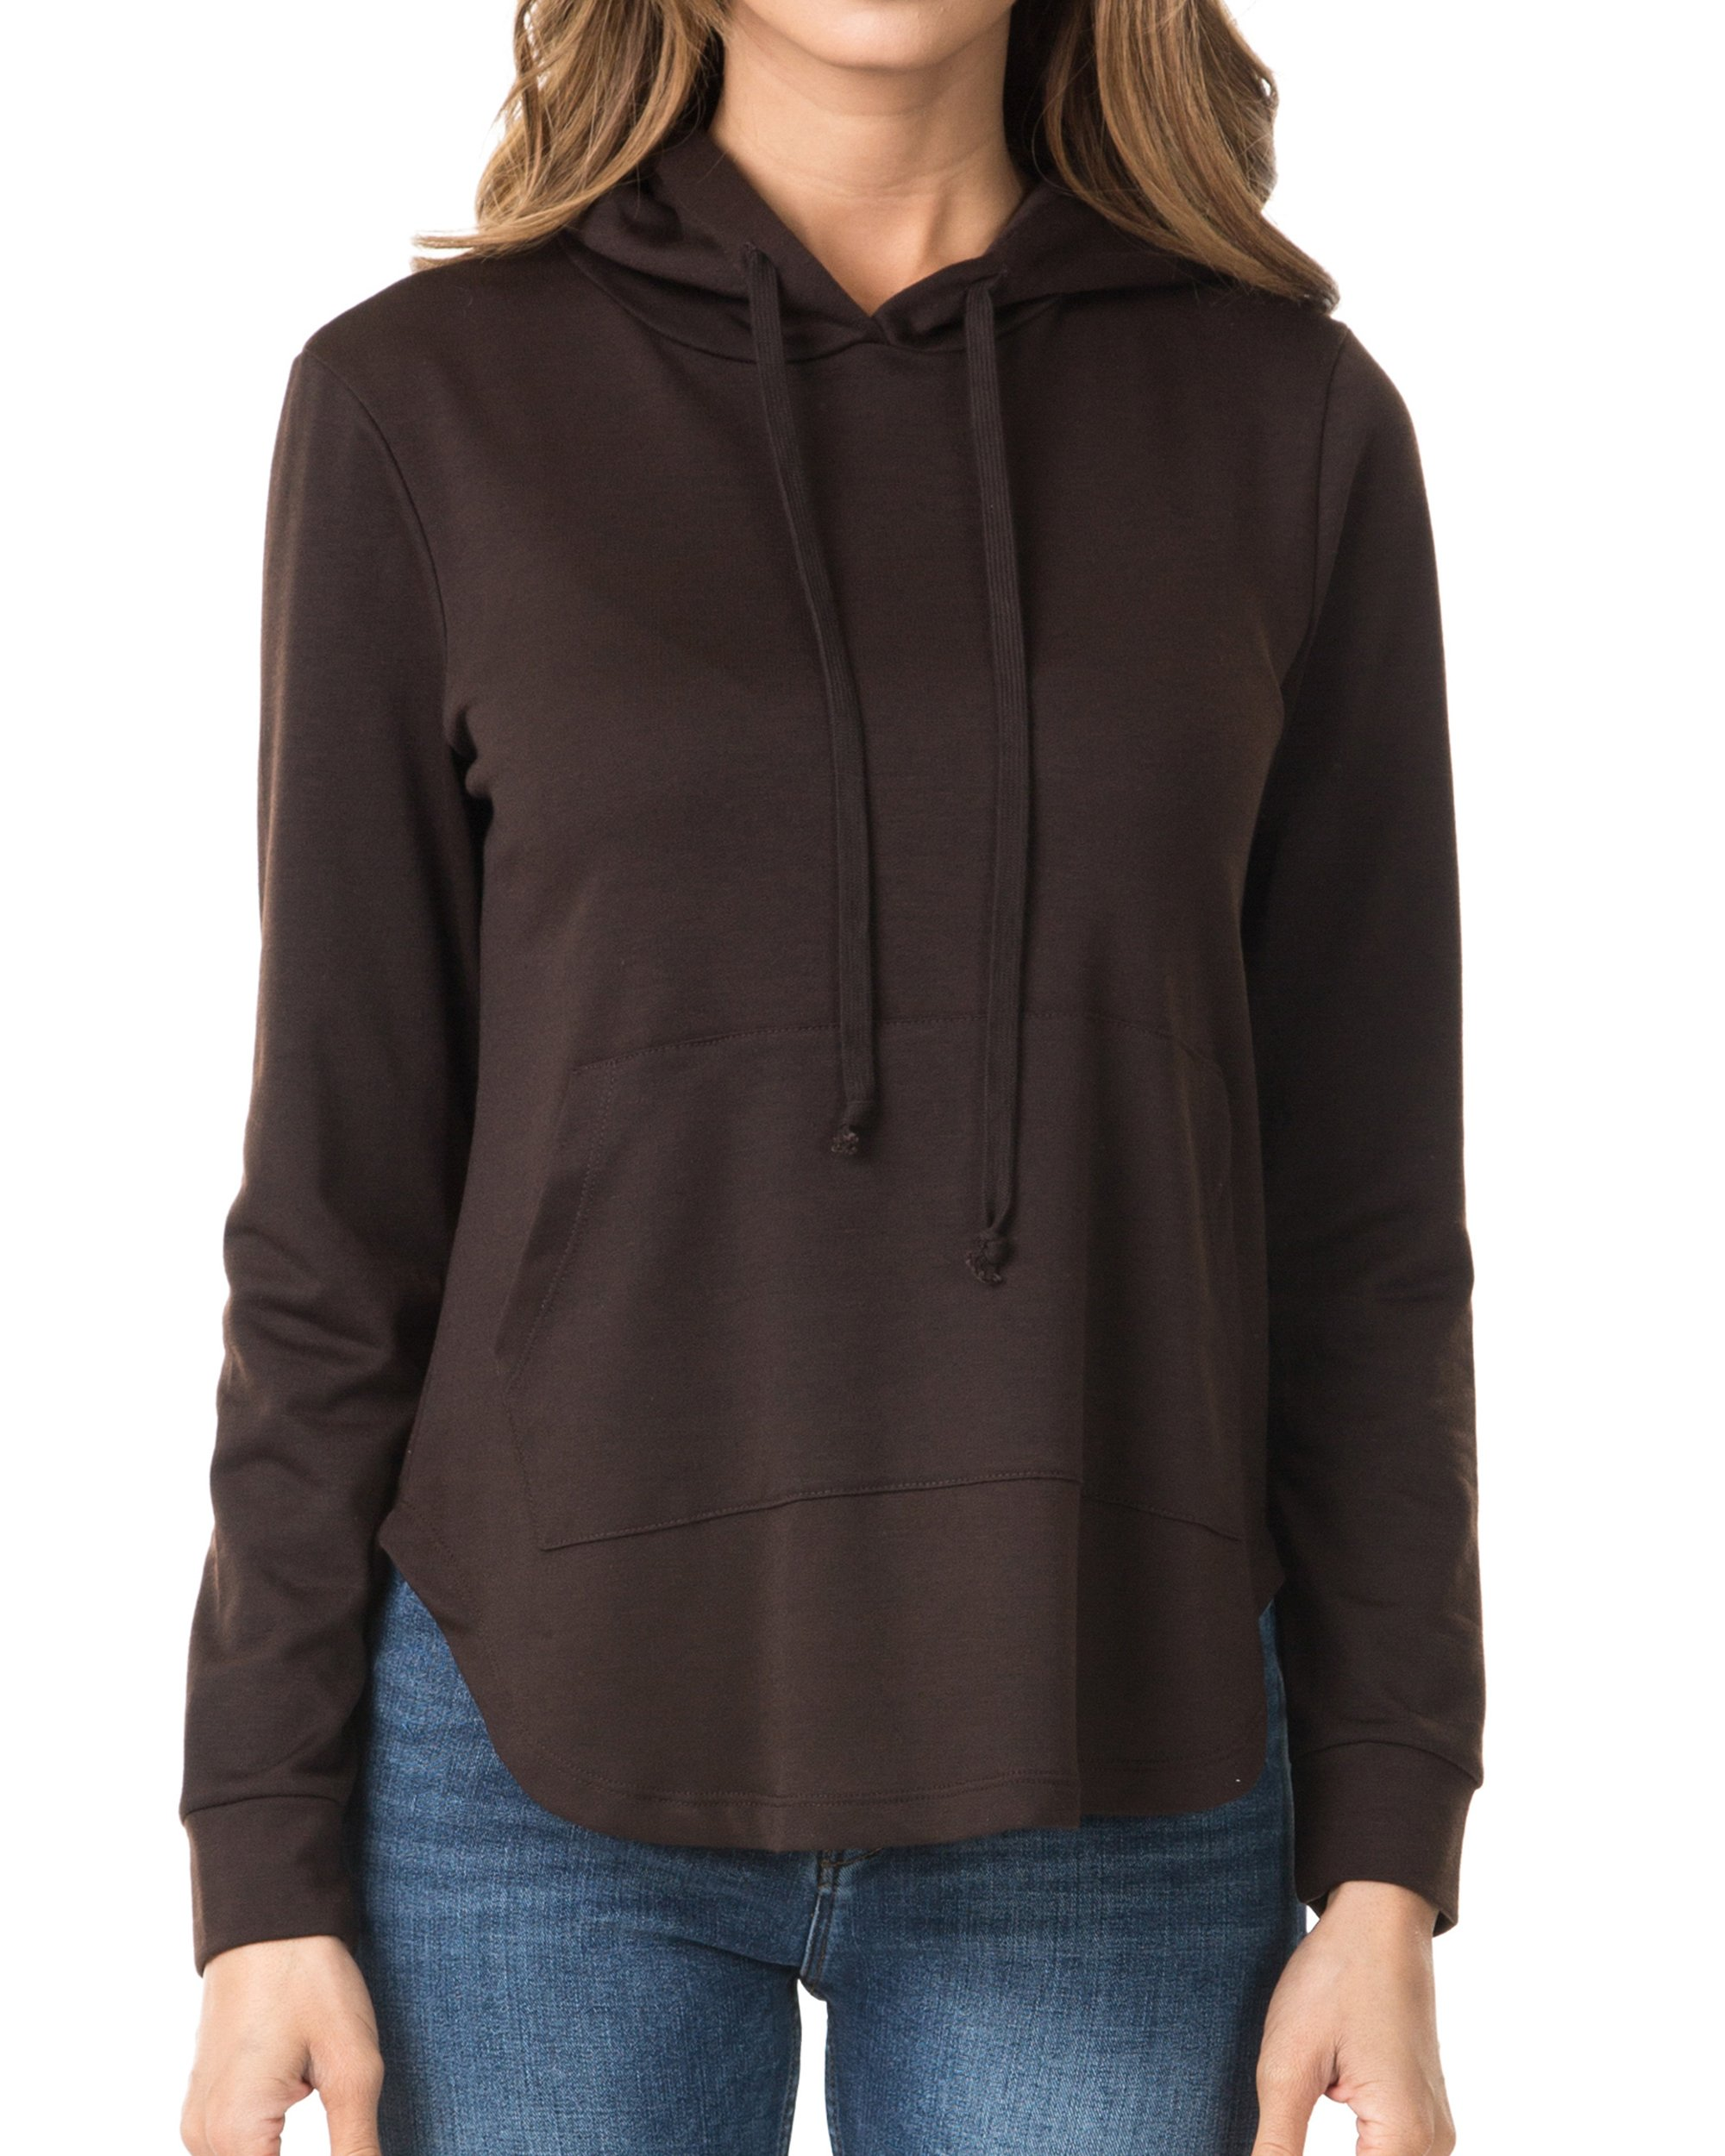 Nolabel B7_023 Women's Long Sleeve Pullover French Terry Drawstring Hoodie Sweatshirt (Brown/XL)